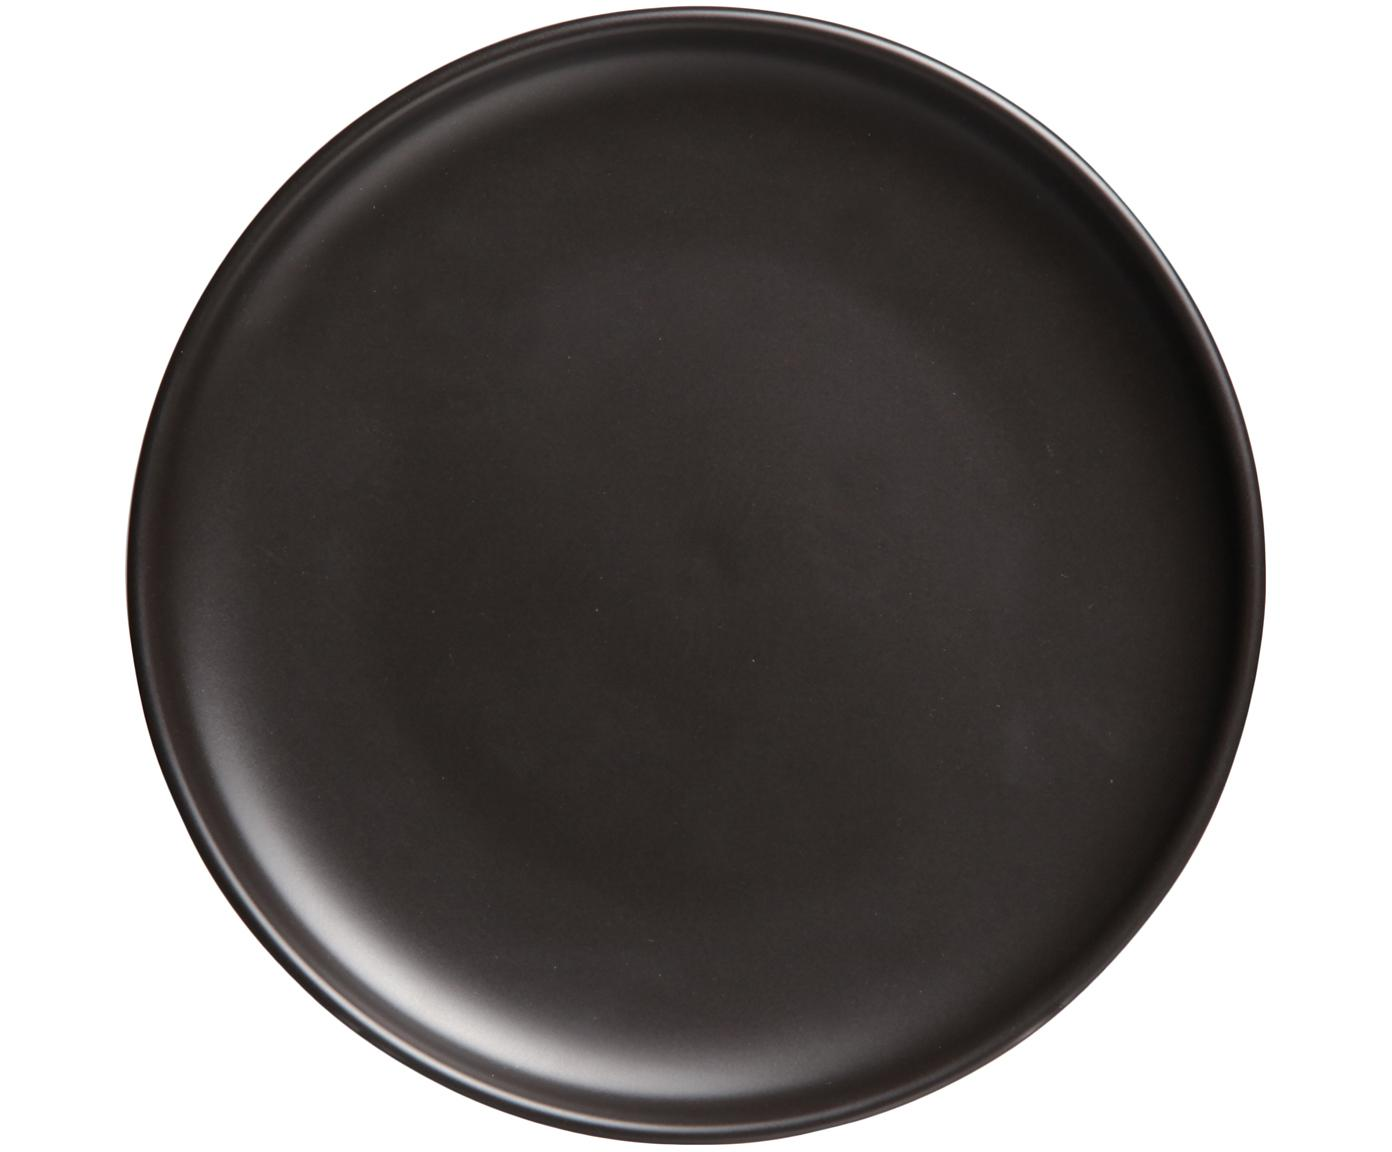 Ontbijtborden Okinawa, 6 stuks, Keramiek, Mat zwart, Ø 20 cm